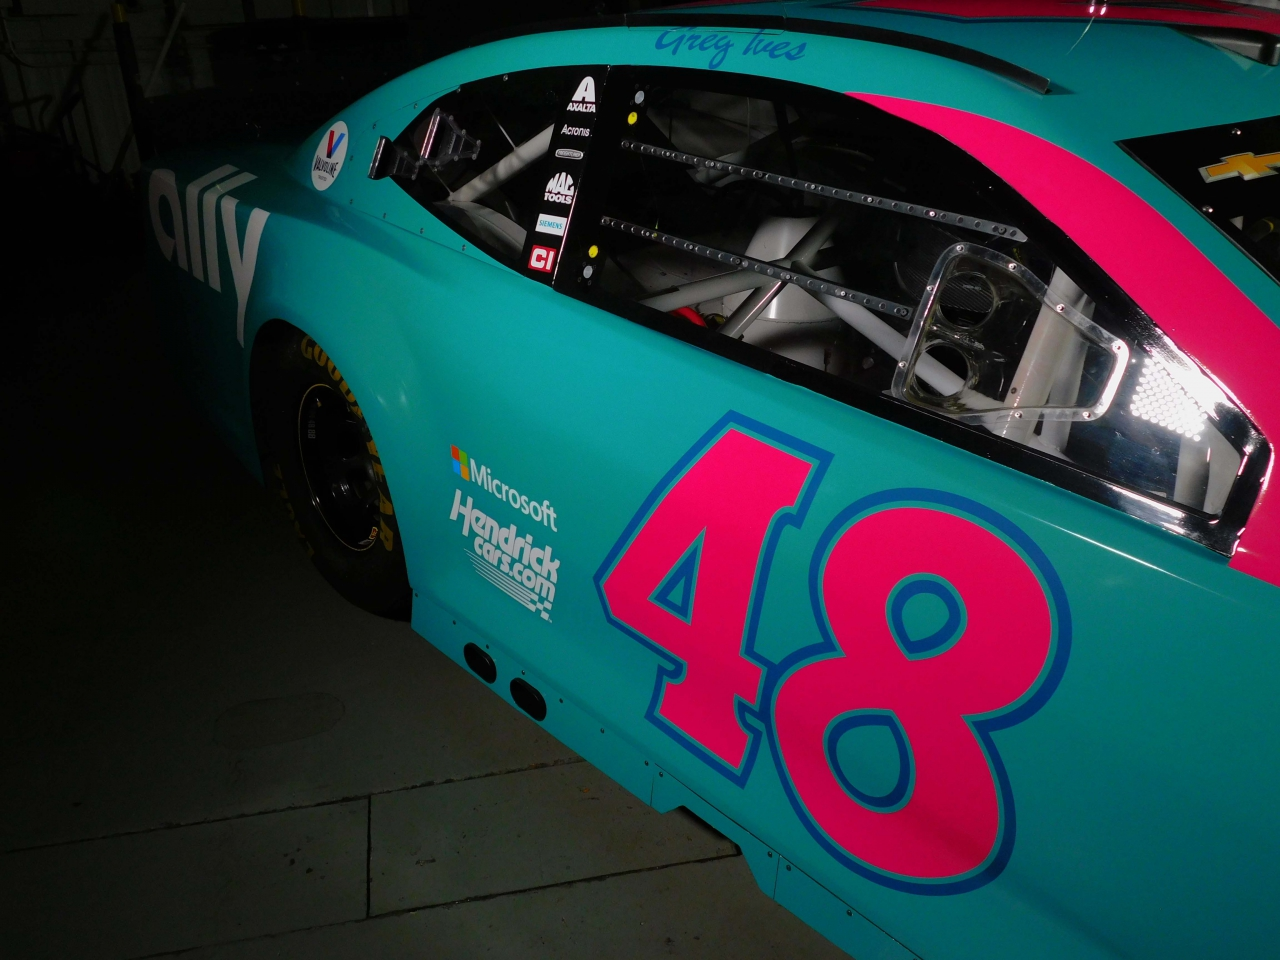 NASCAR Cup Series - Alex Bowman - 2021 Darlington Raceway throwback to Greg Ives